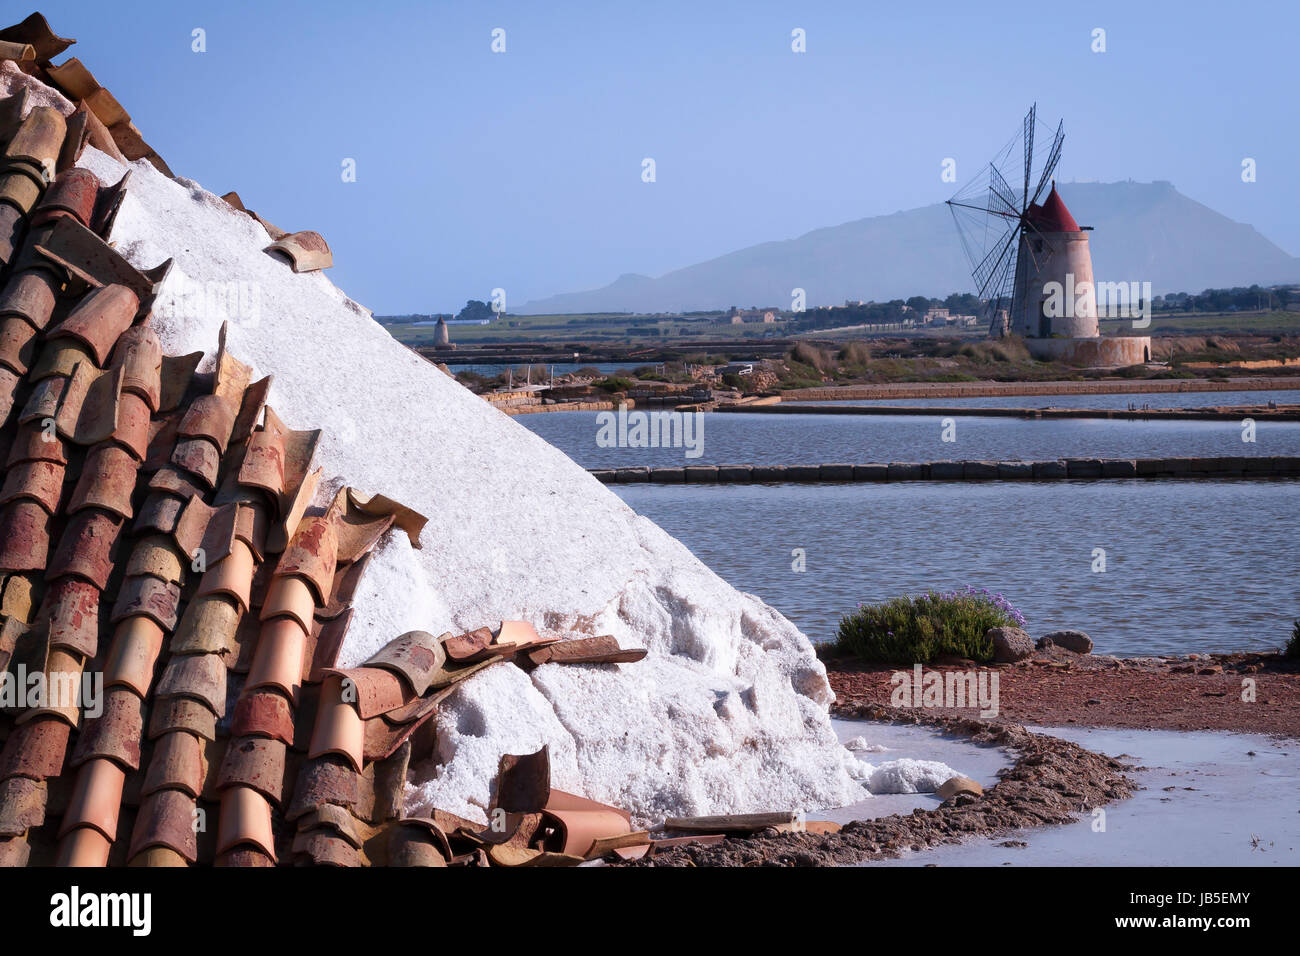 Salt Flats, Marsala, Sicily, Italy. - Stock Image